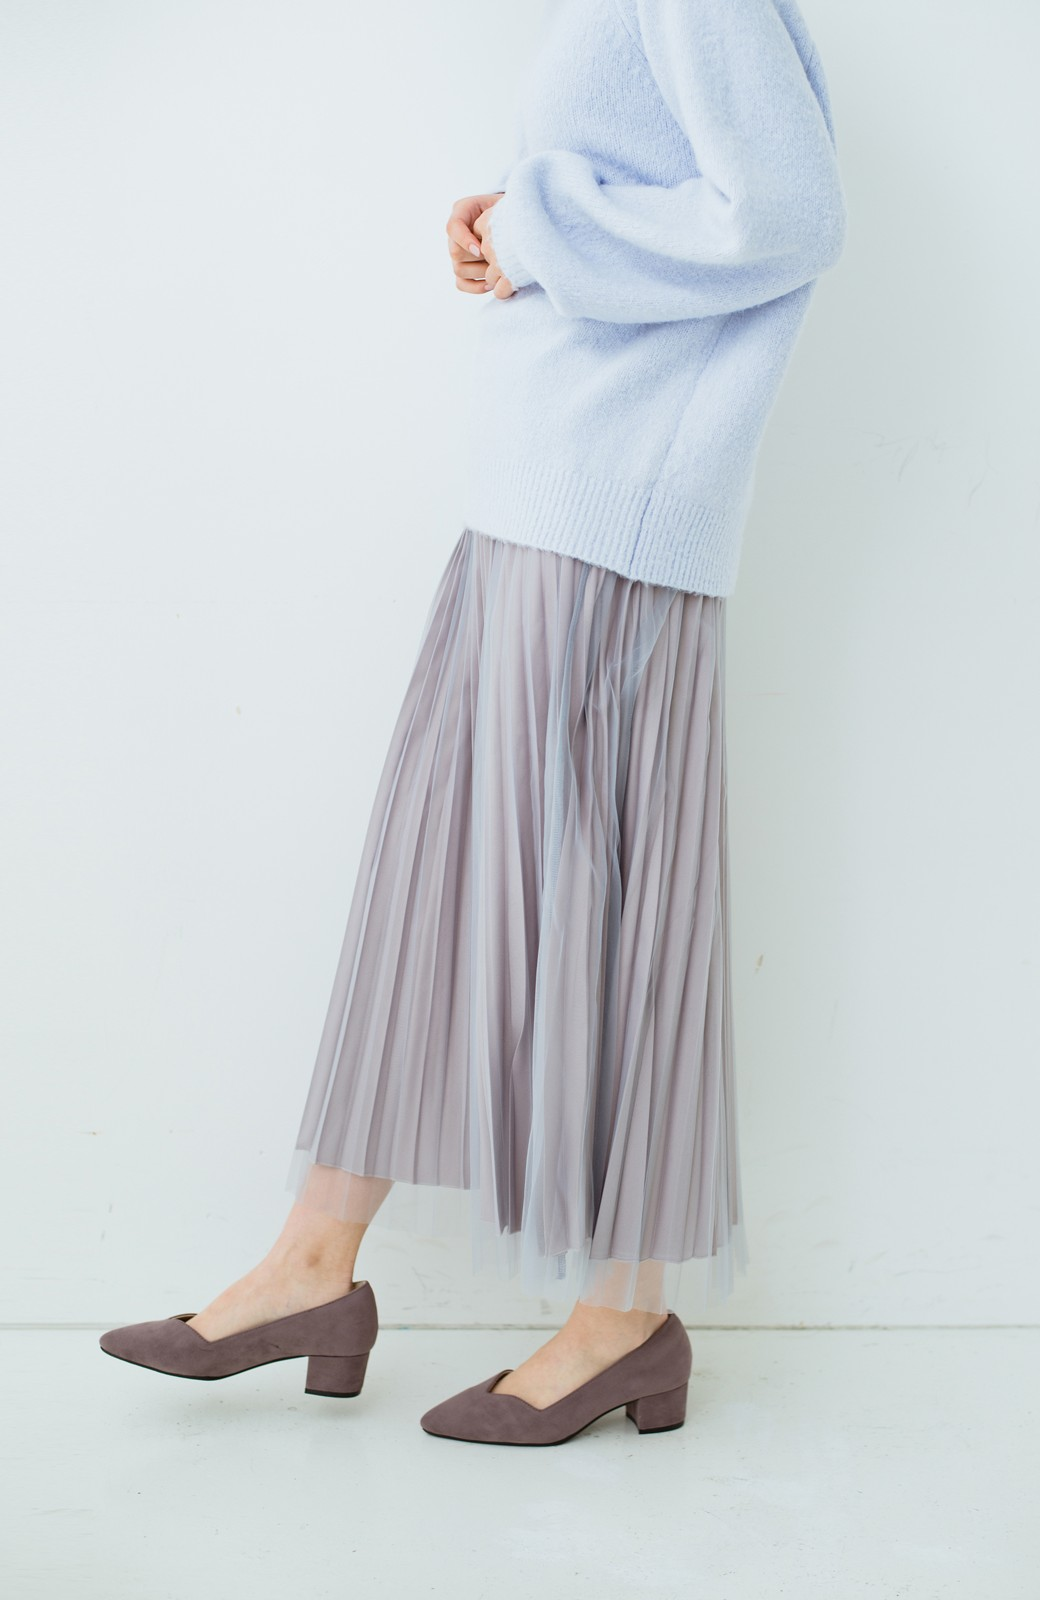 haco! どんな日も華やか気分にしてくれる 二枚仕立てのチュールプリーツスカート <ライトグレー>の商品写真8